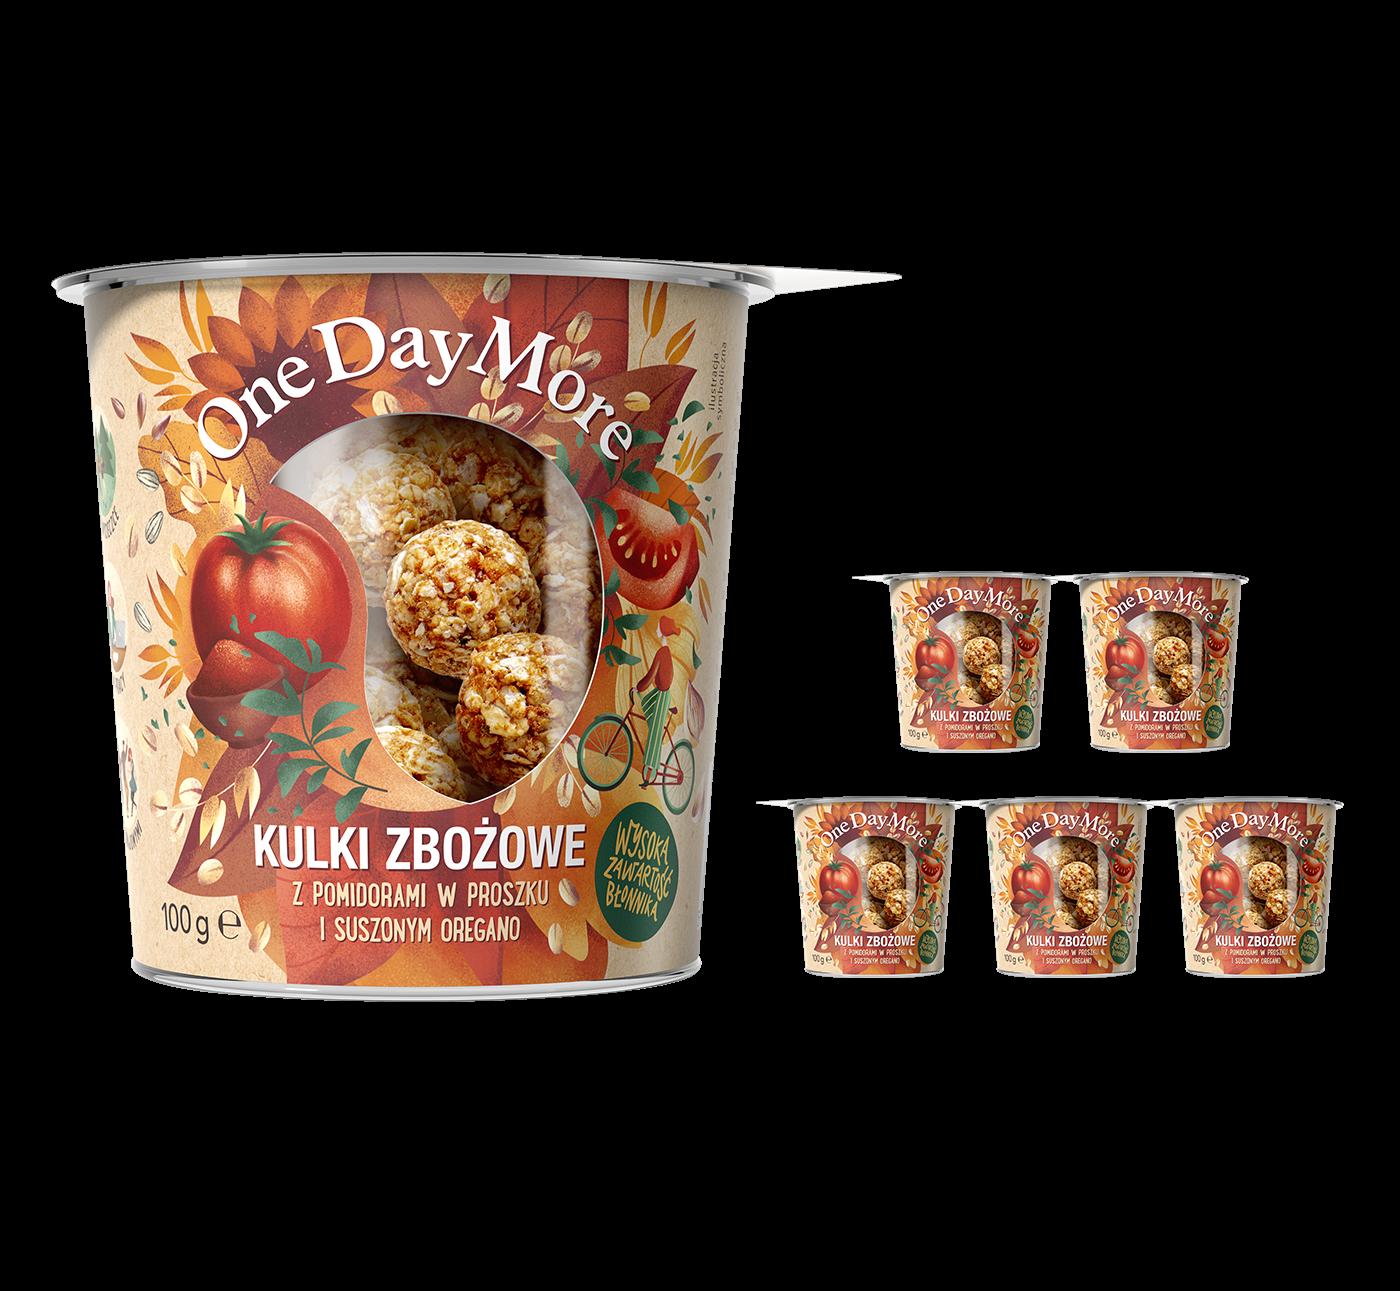 PL_Duzy_5_Malych_Pomidor_Oregano_1400x1291_v2 (2)